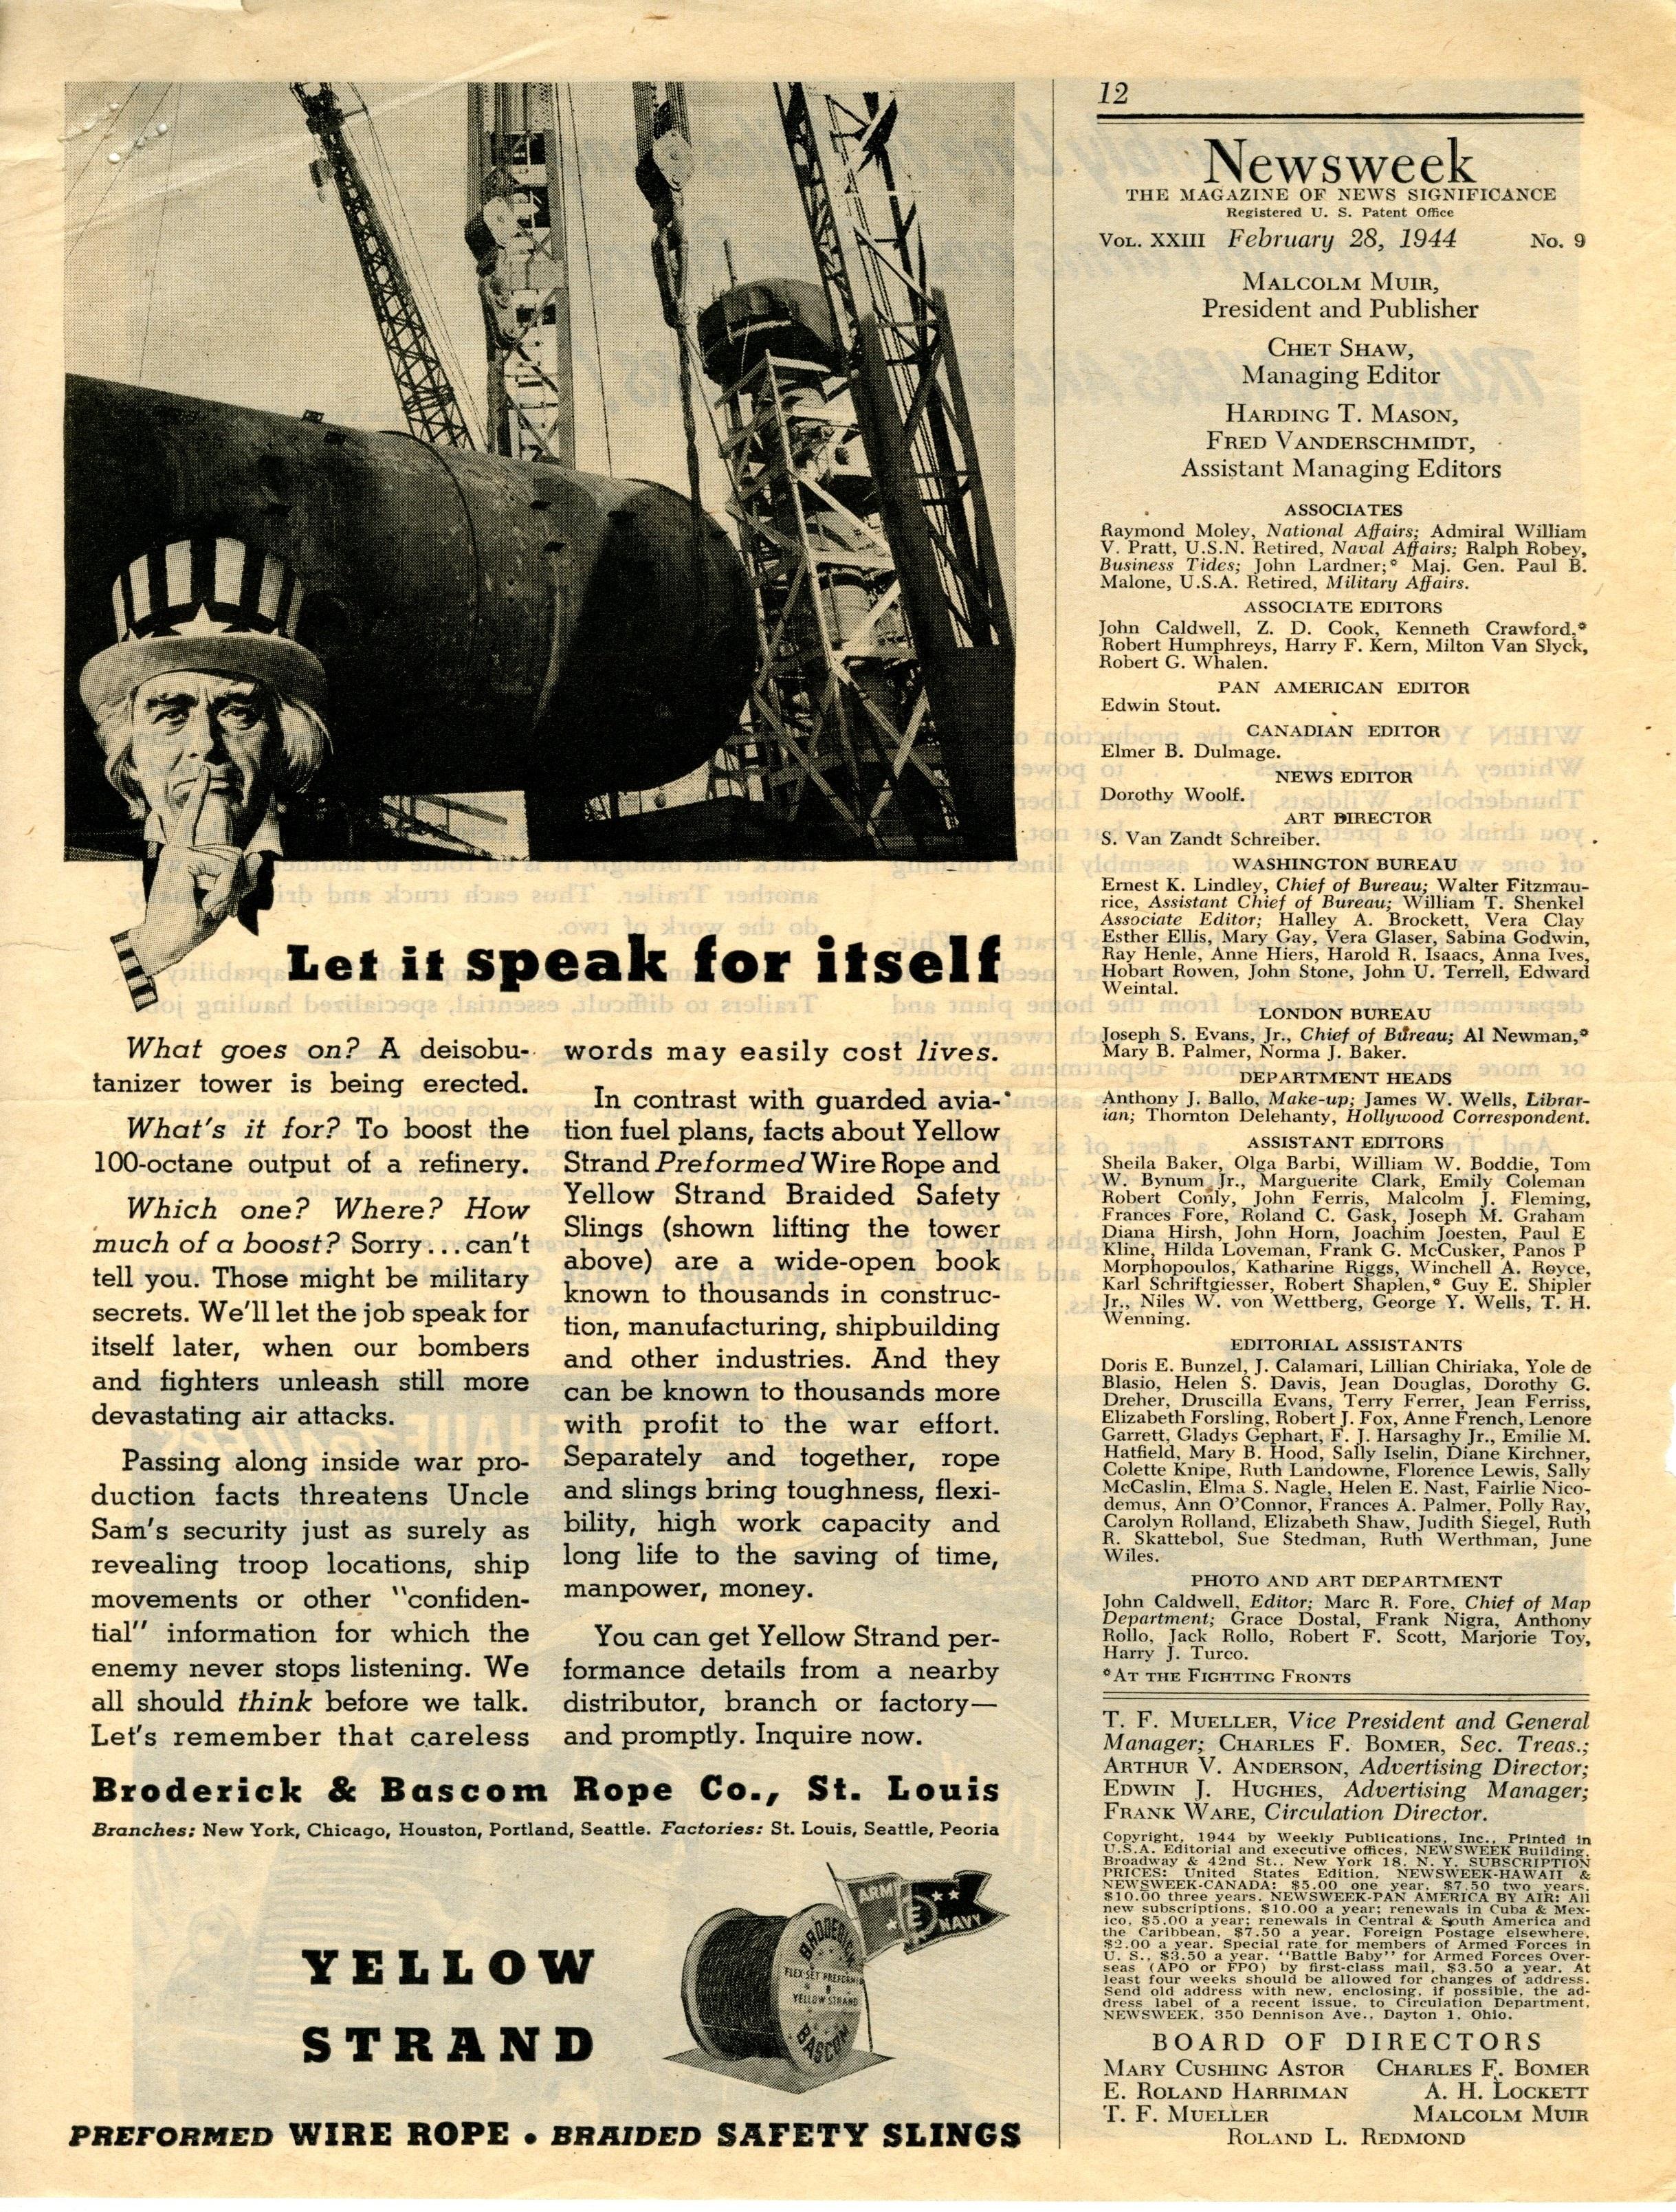 Broderick & Bascom Rope Co. Advertisement in Newsweek magazine.